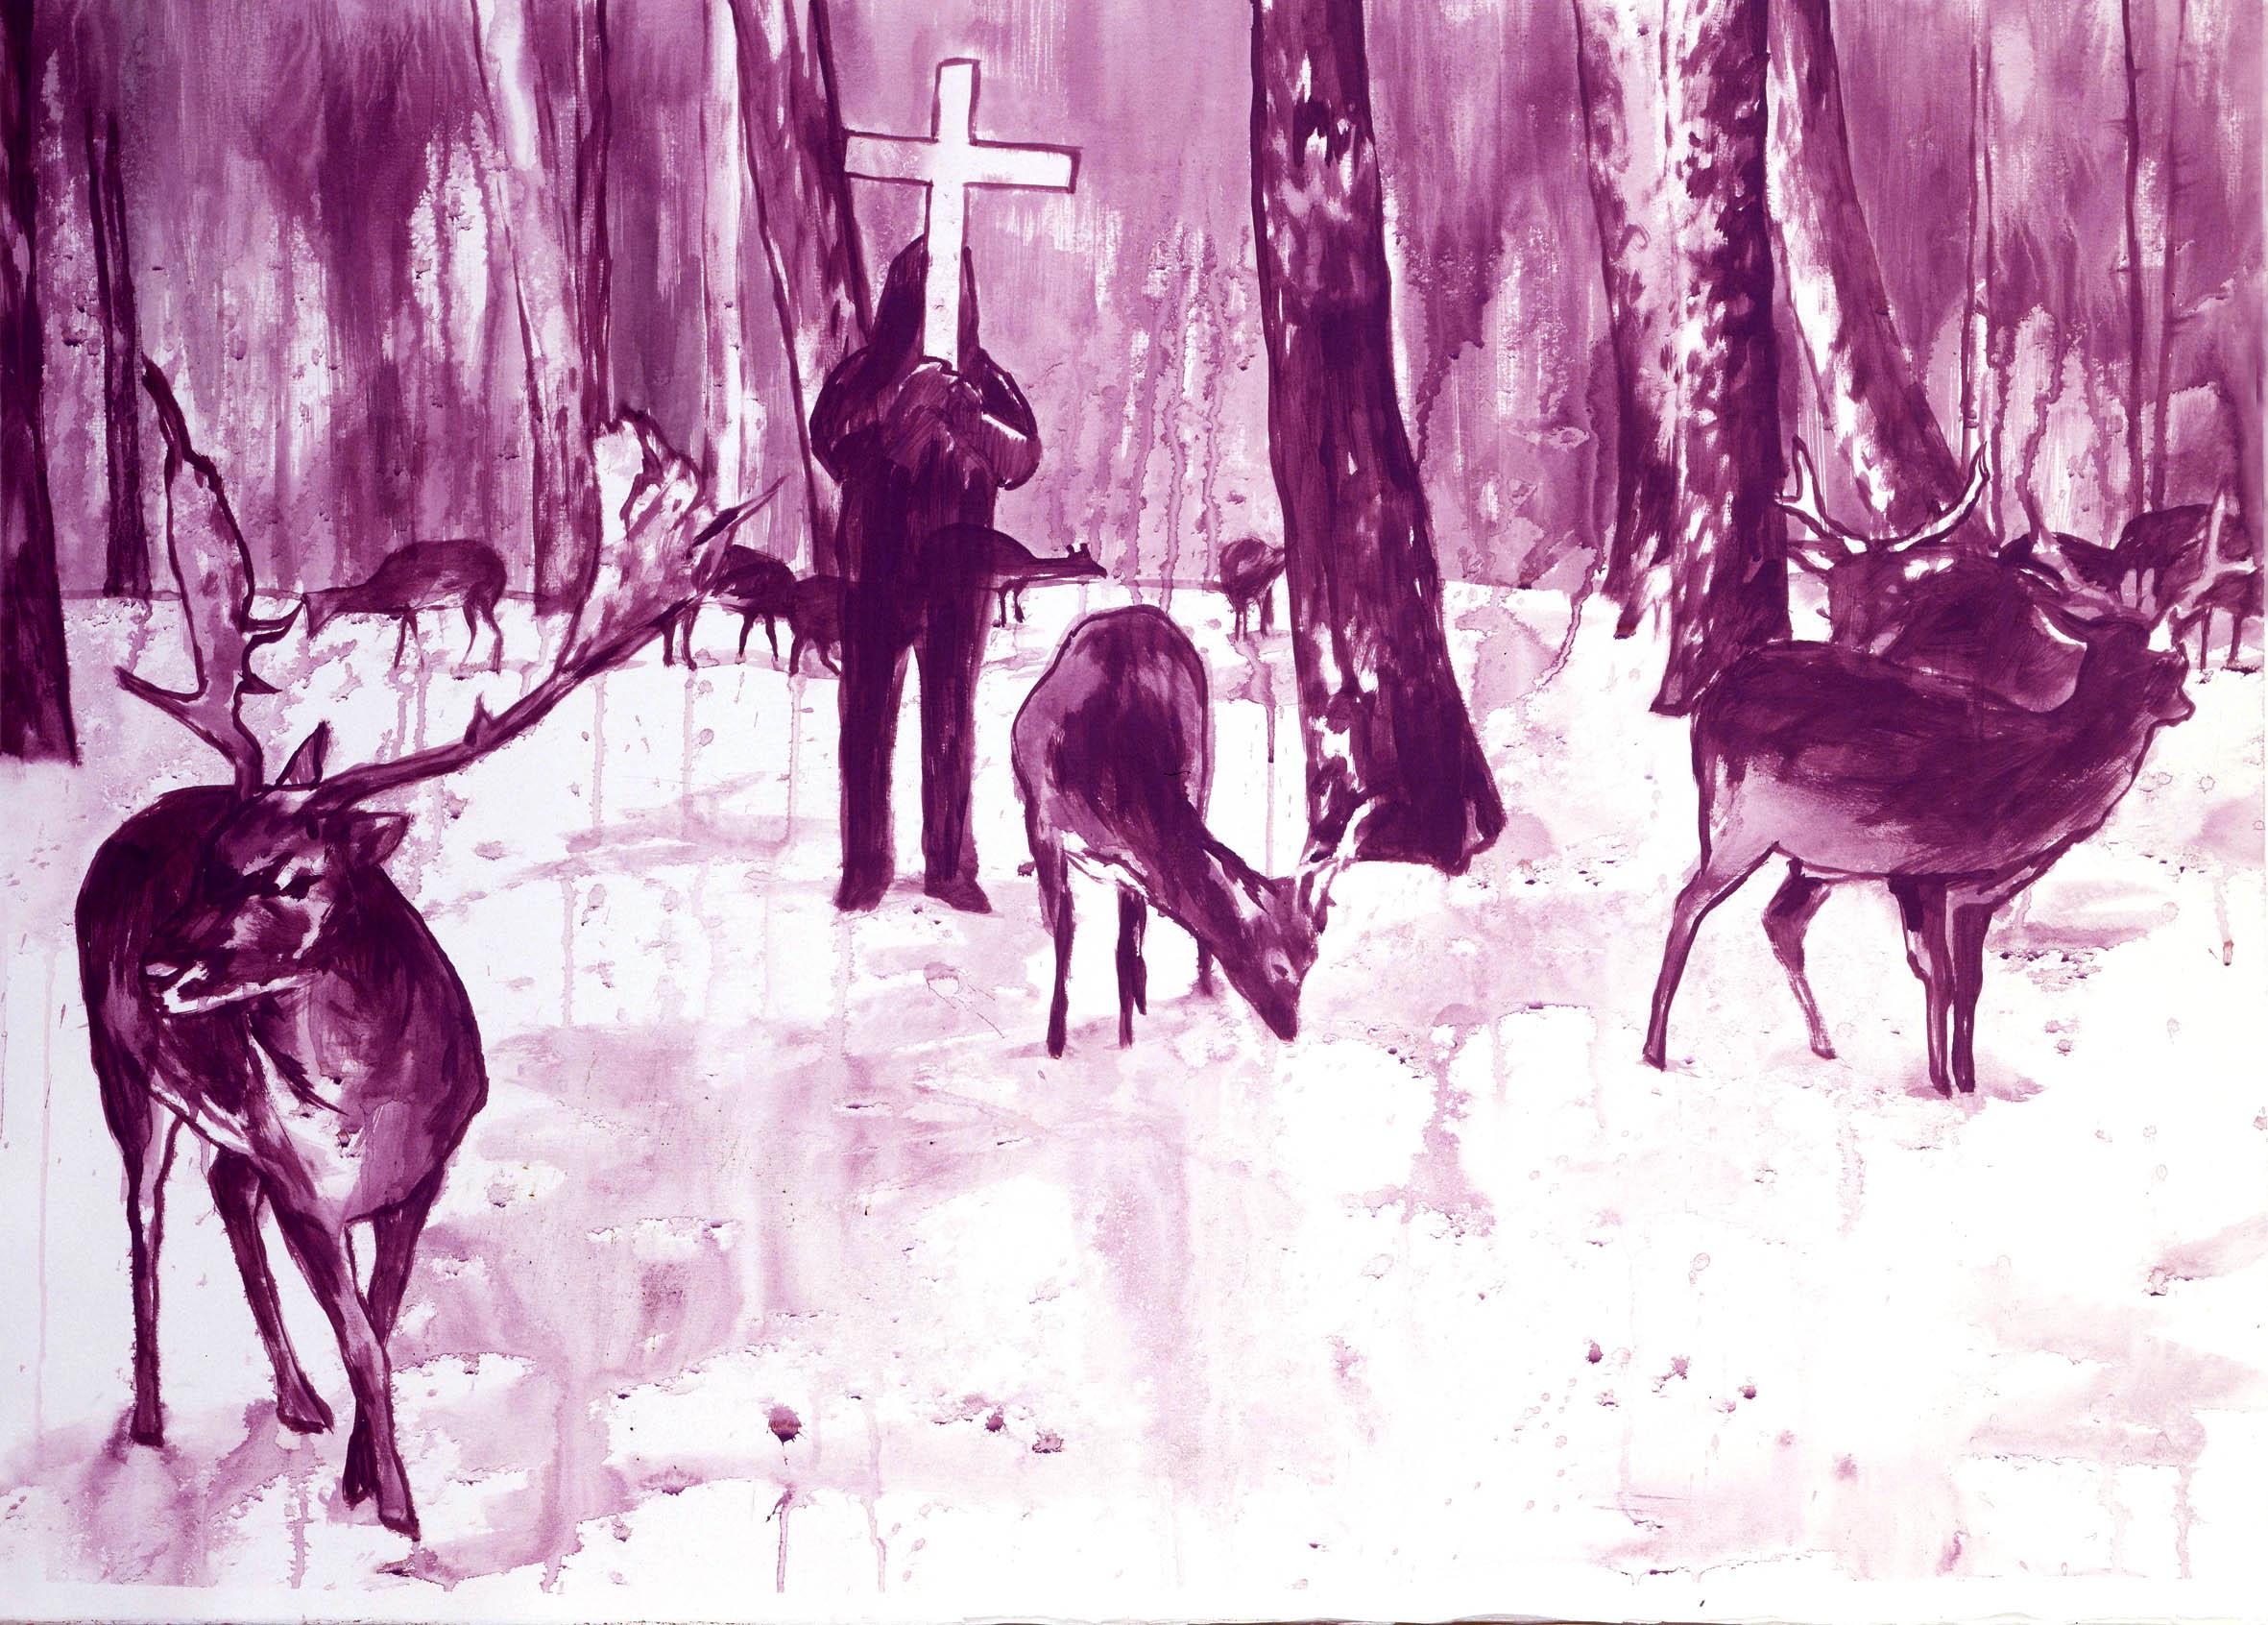 Luigi Presicce, ST, 06, acrilico su carta, 80x 100 cm